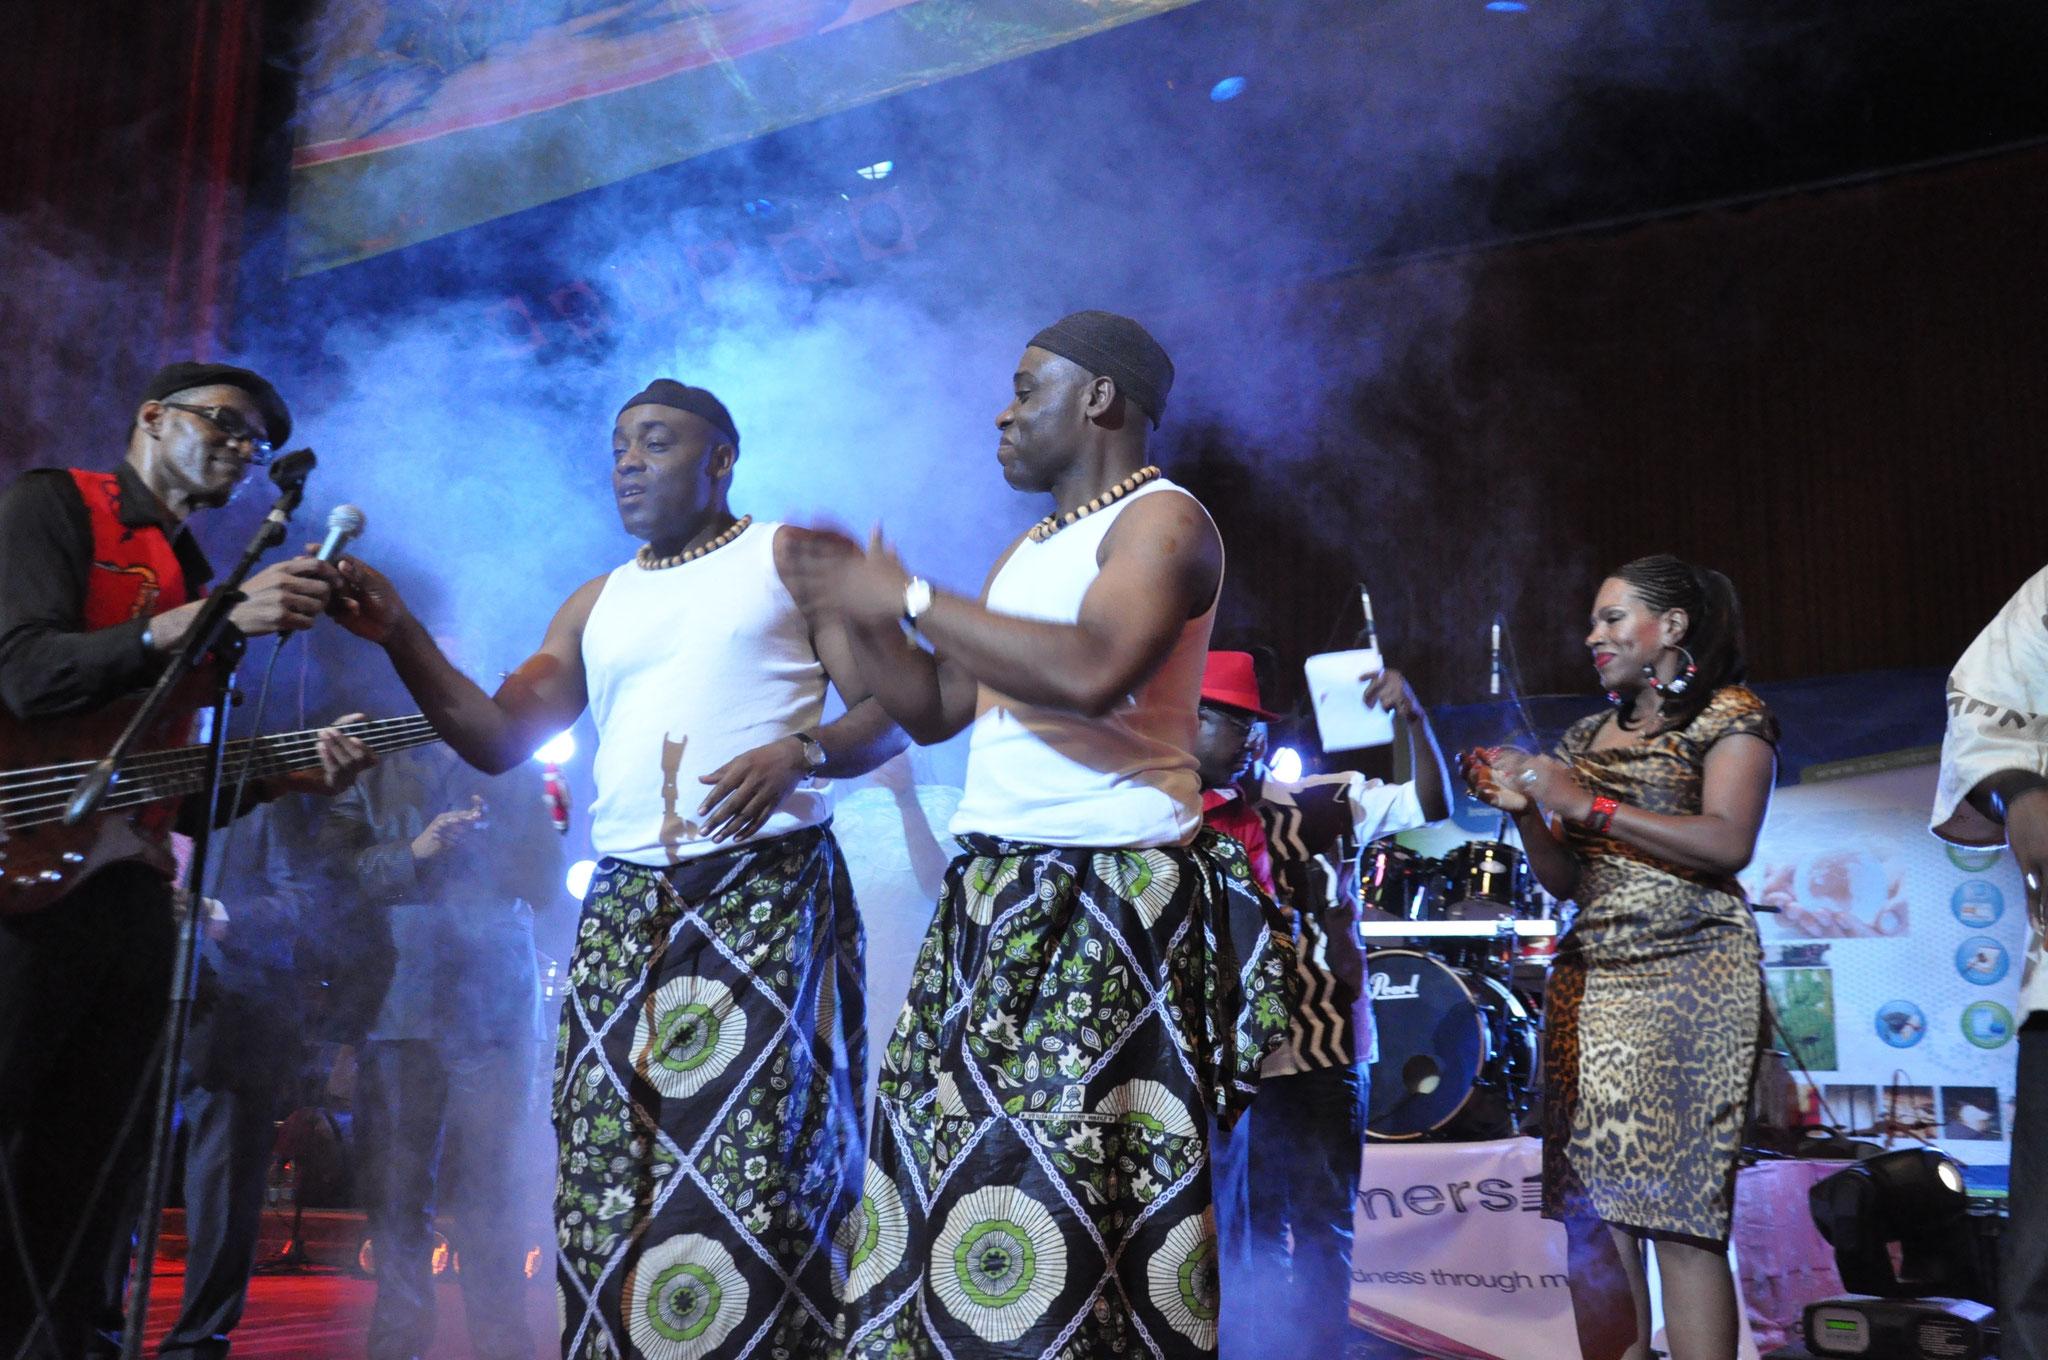 Les Jumeaux de MASAO (Masao Masu) avec l'actrice américaine Sheryl Lee Ralph au Palais des congrès de Yaoundé Cameroun . Photo : Claude Badaha